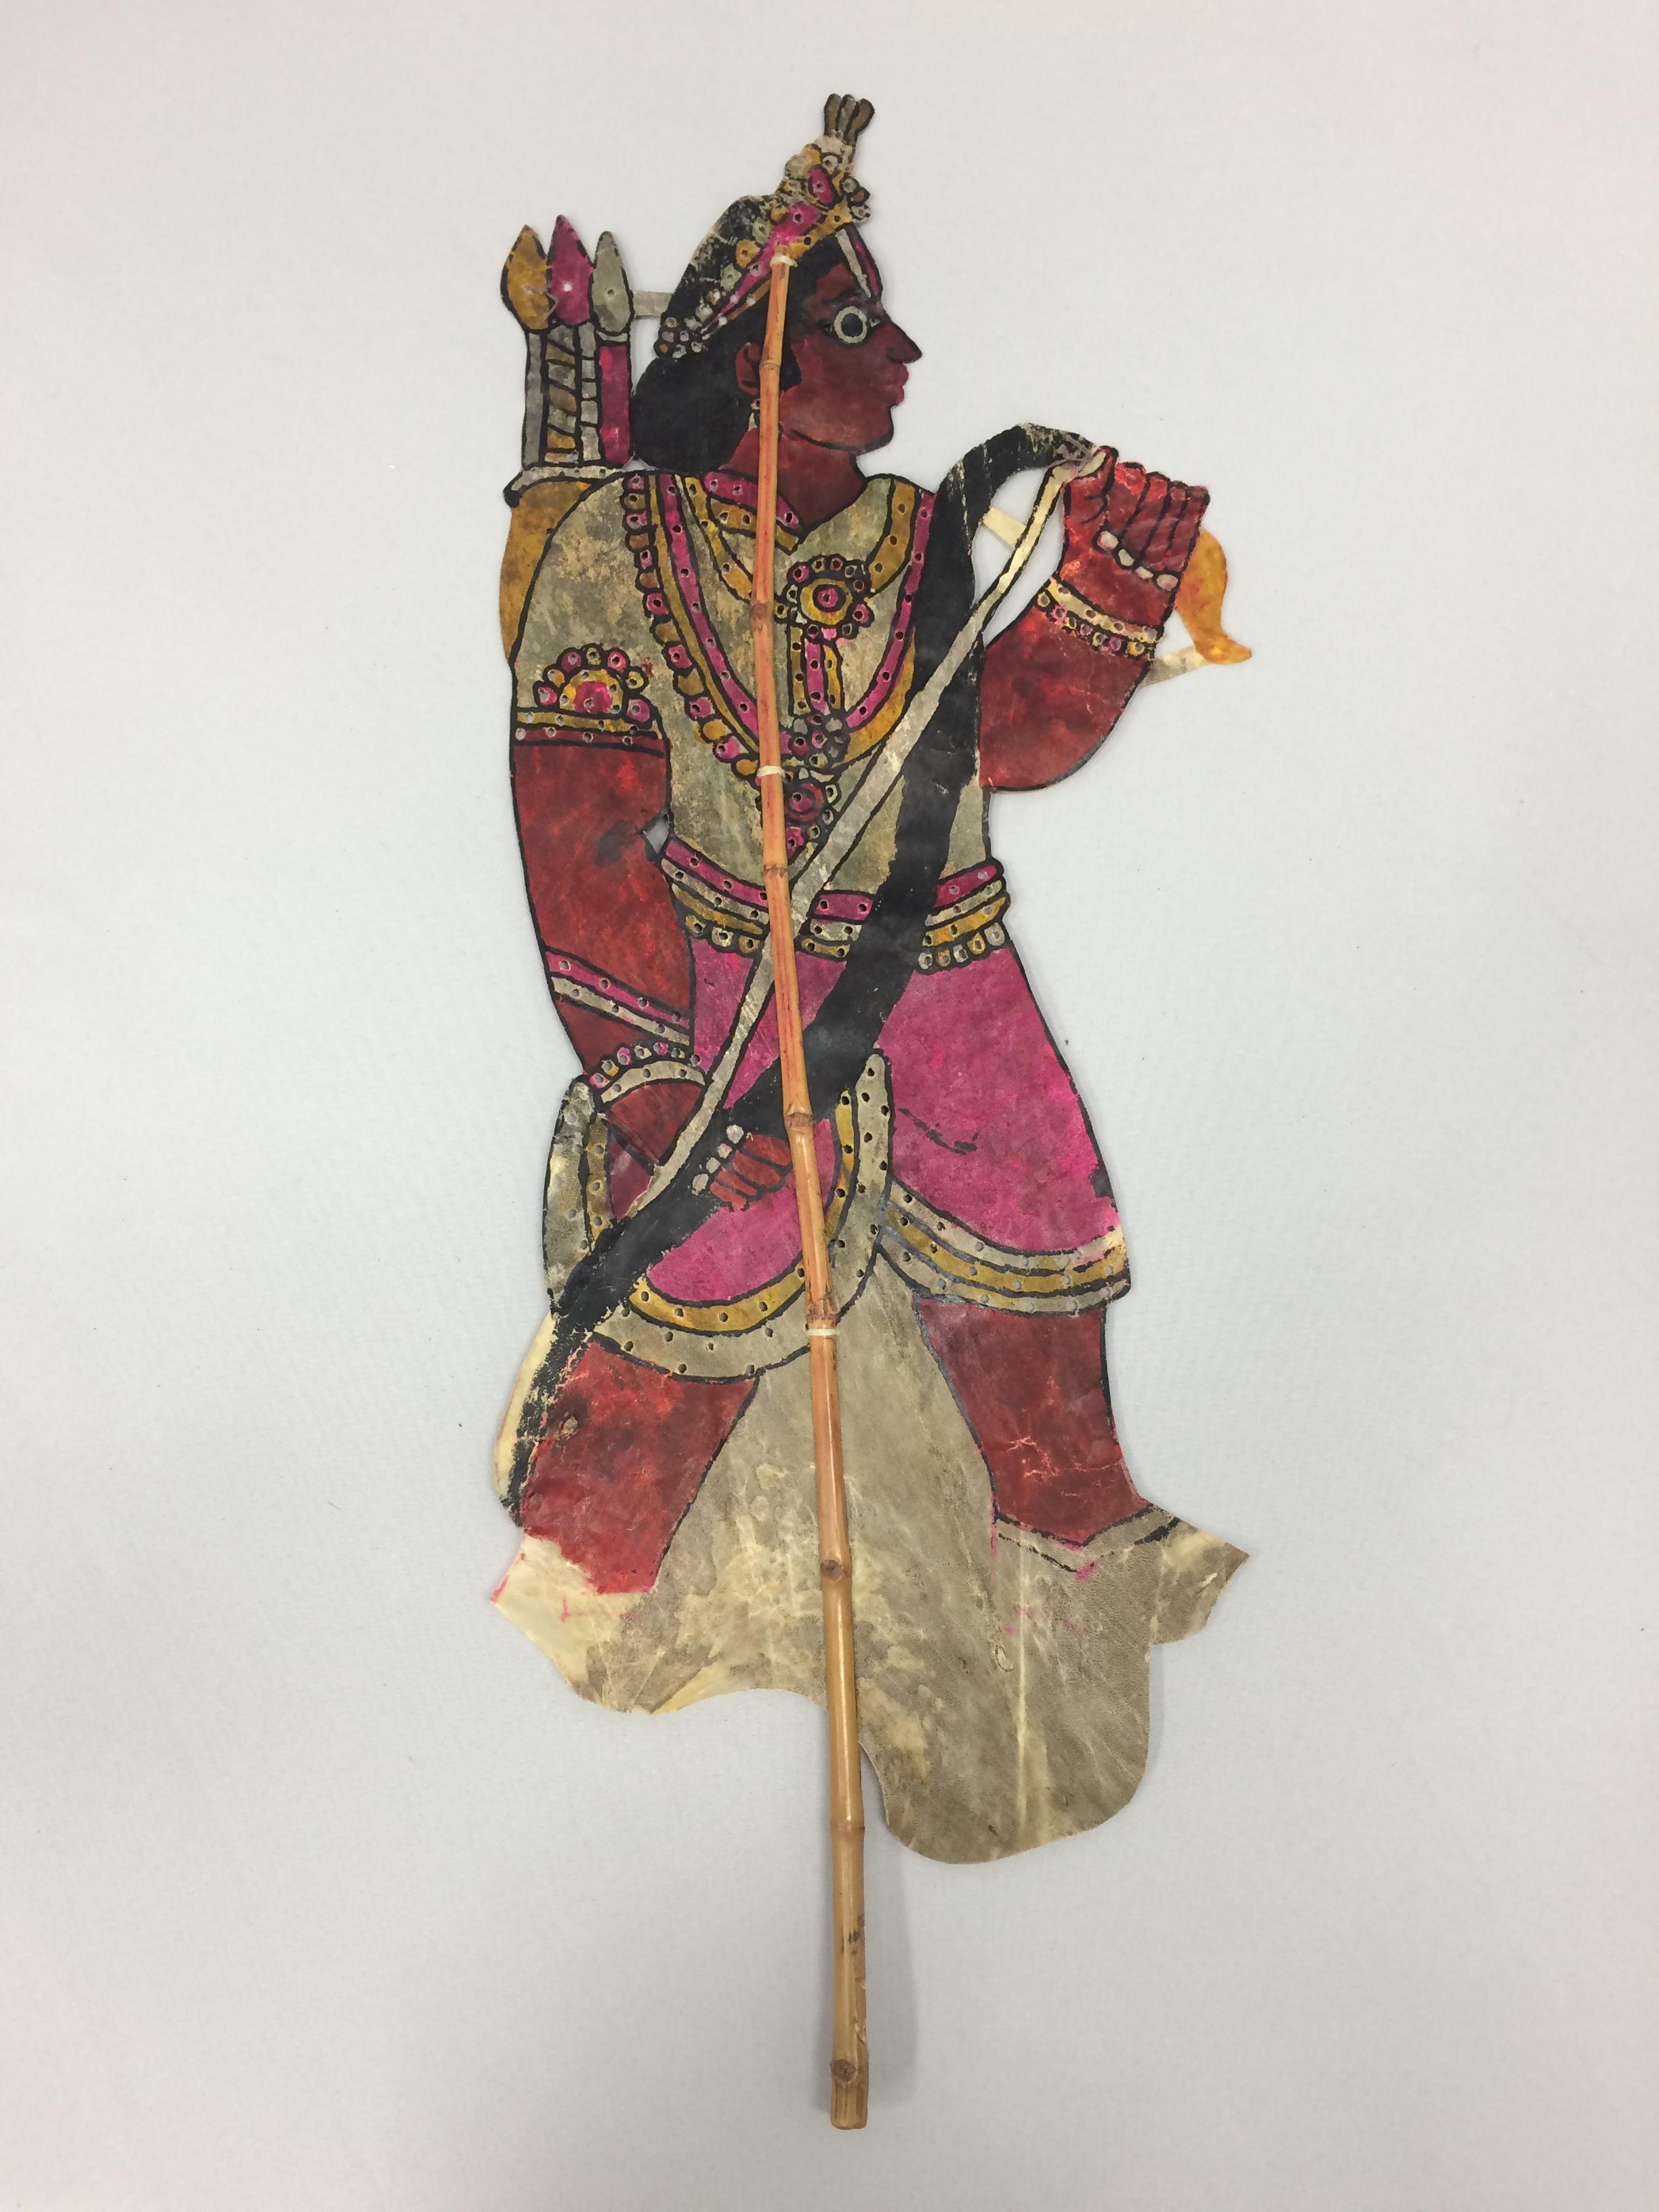 Lakshmana, du Râmâyana, une marionnette d'ombre traditionnel, togalu gombeya</em>ta</em>, de Karnataka, en Inde, hauteur : 64 cm. Collection: Center for Puppetry Arts (Georgia, Atlanta, United States), donated by Melvyn Helstien (1991)